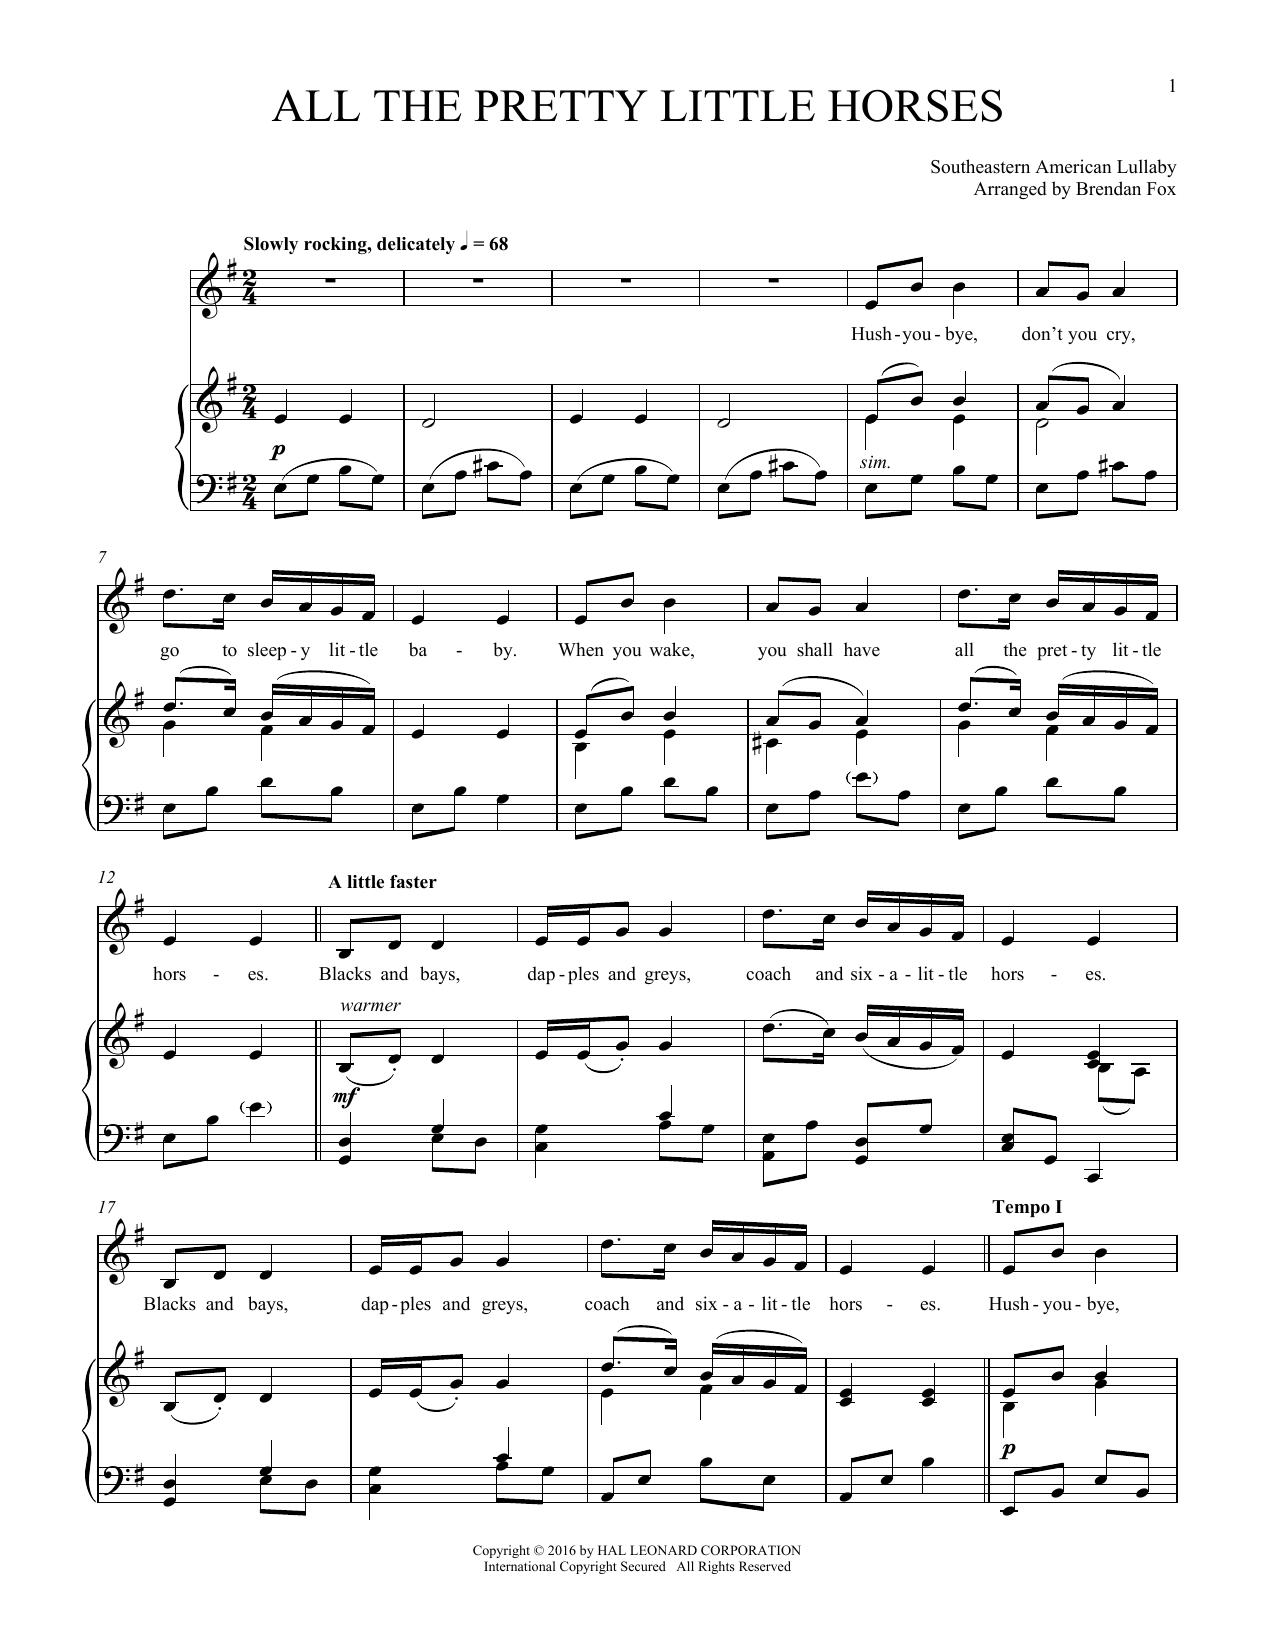 All The Pretty Little Horses (Piano & Vocal)